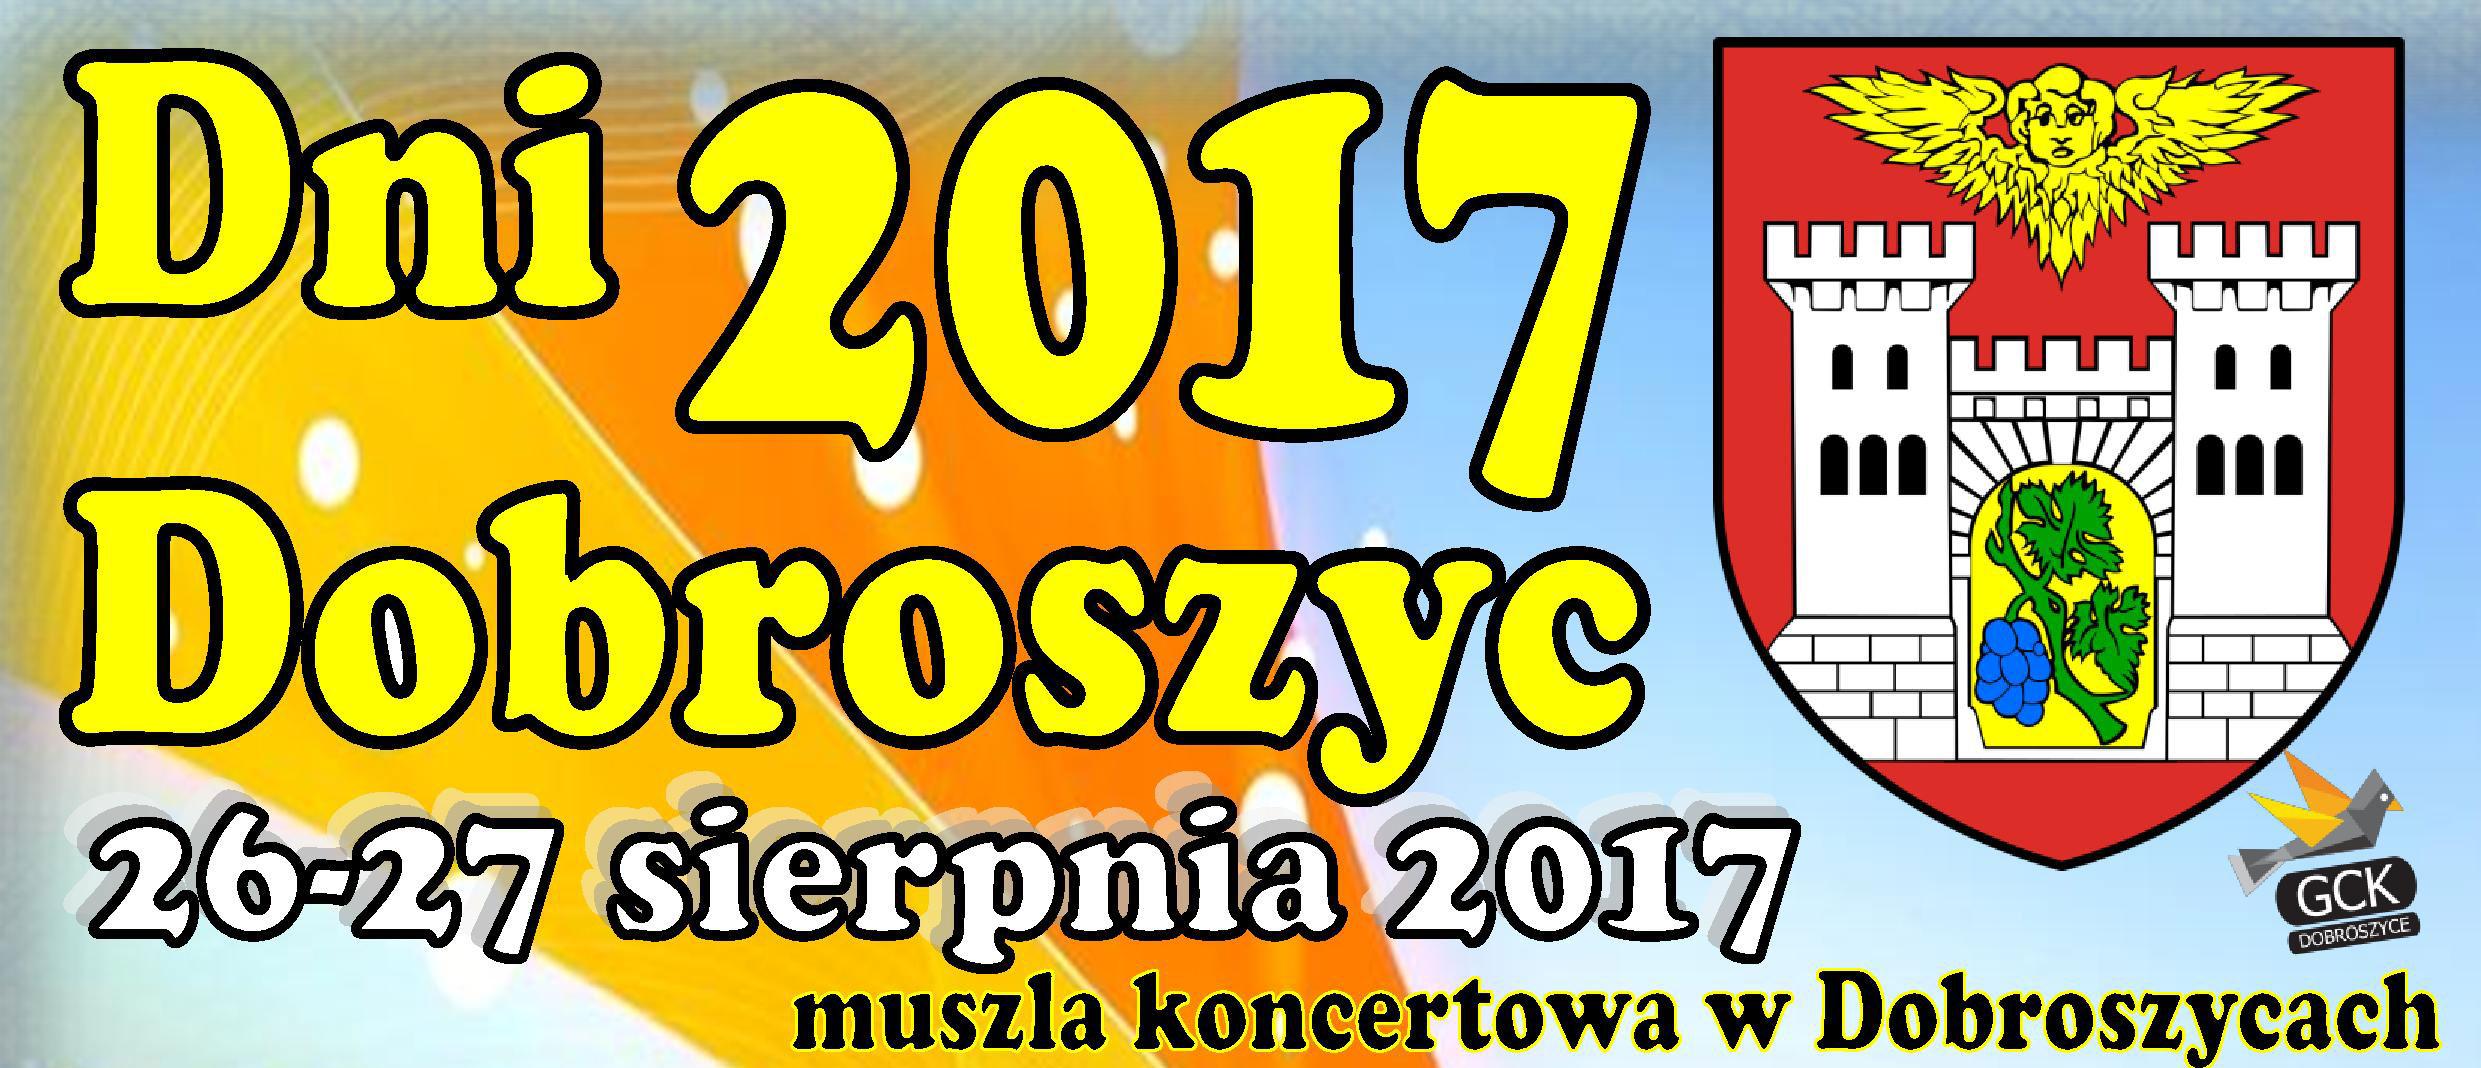 Dni Dobroszyc 2017